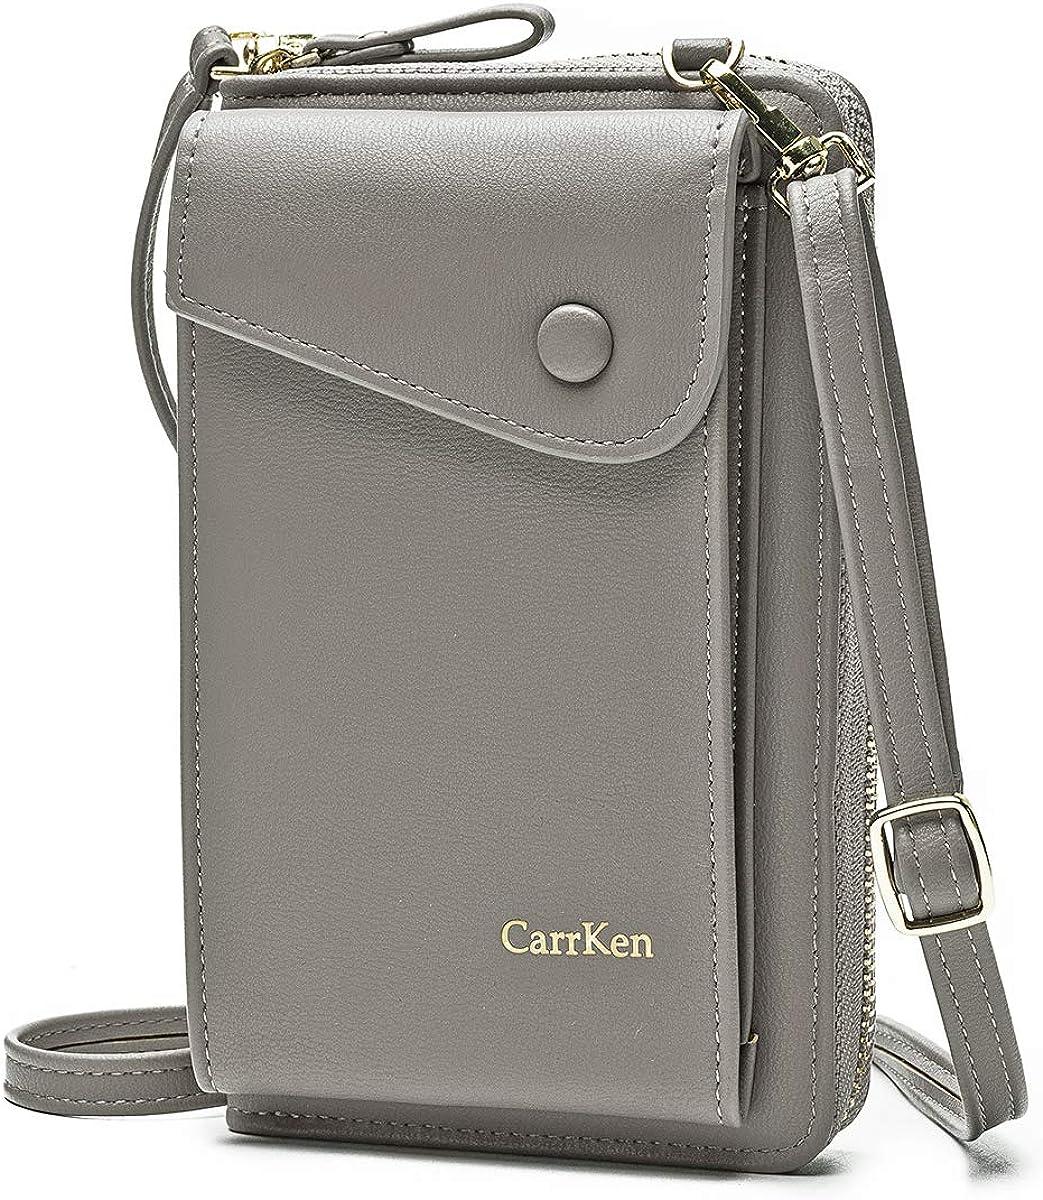 JOSEKO Ladies Crossbody Bags Stylish Women Leather Wallet Cute Small Coin Purse Mini Shoulder Bag Travel Clutch Bag Phone Bag